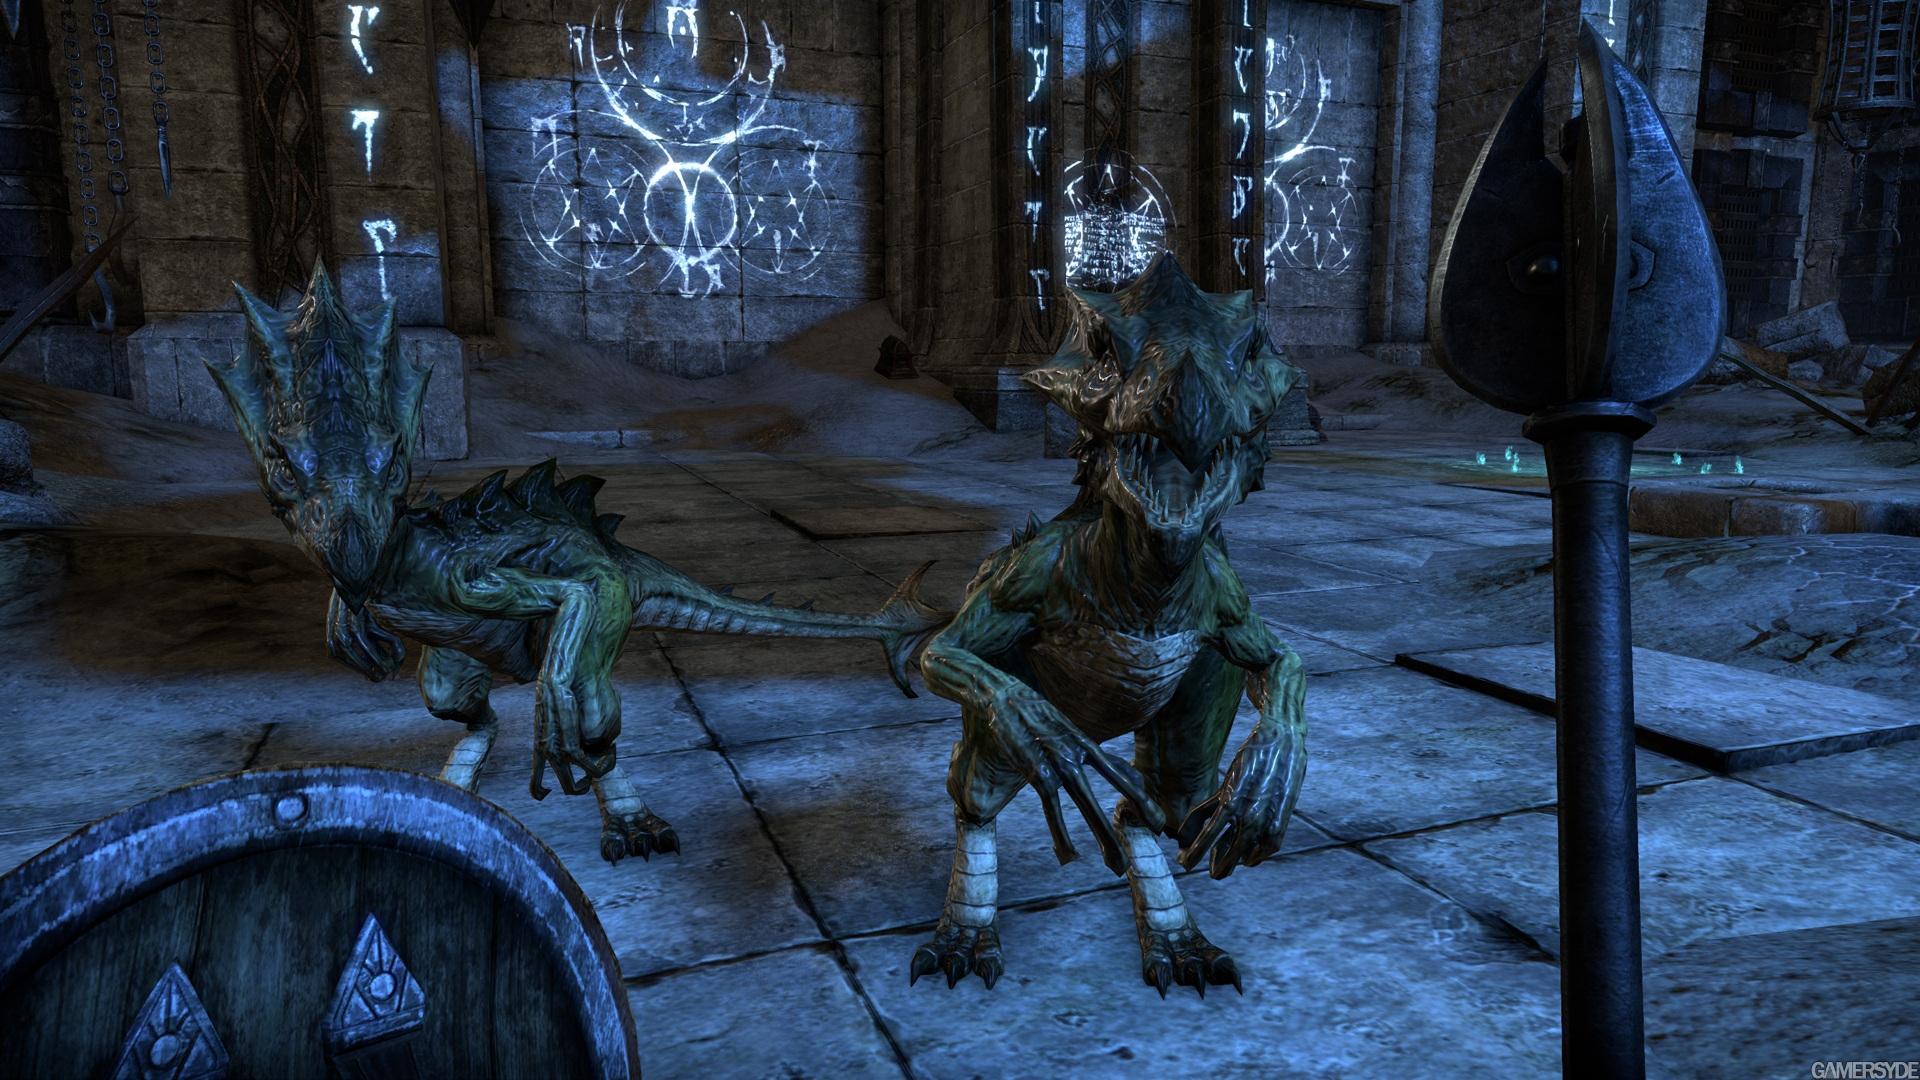 The Elder Scrolls Online: Tamriel Unlimited PC Digital - CD Keys for